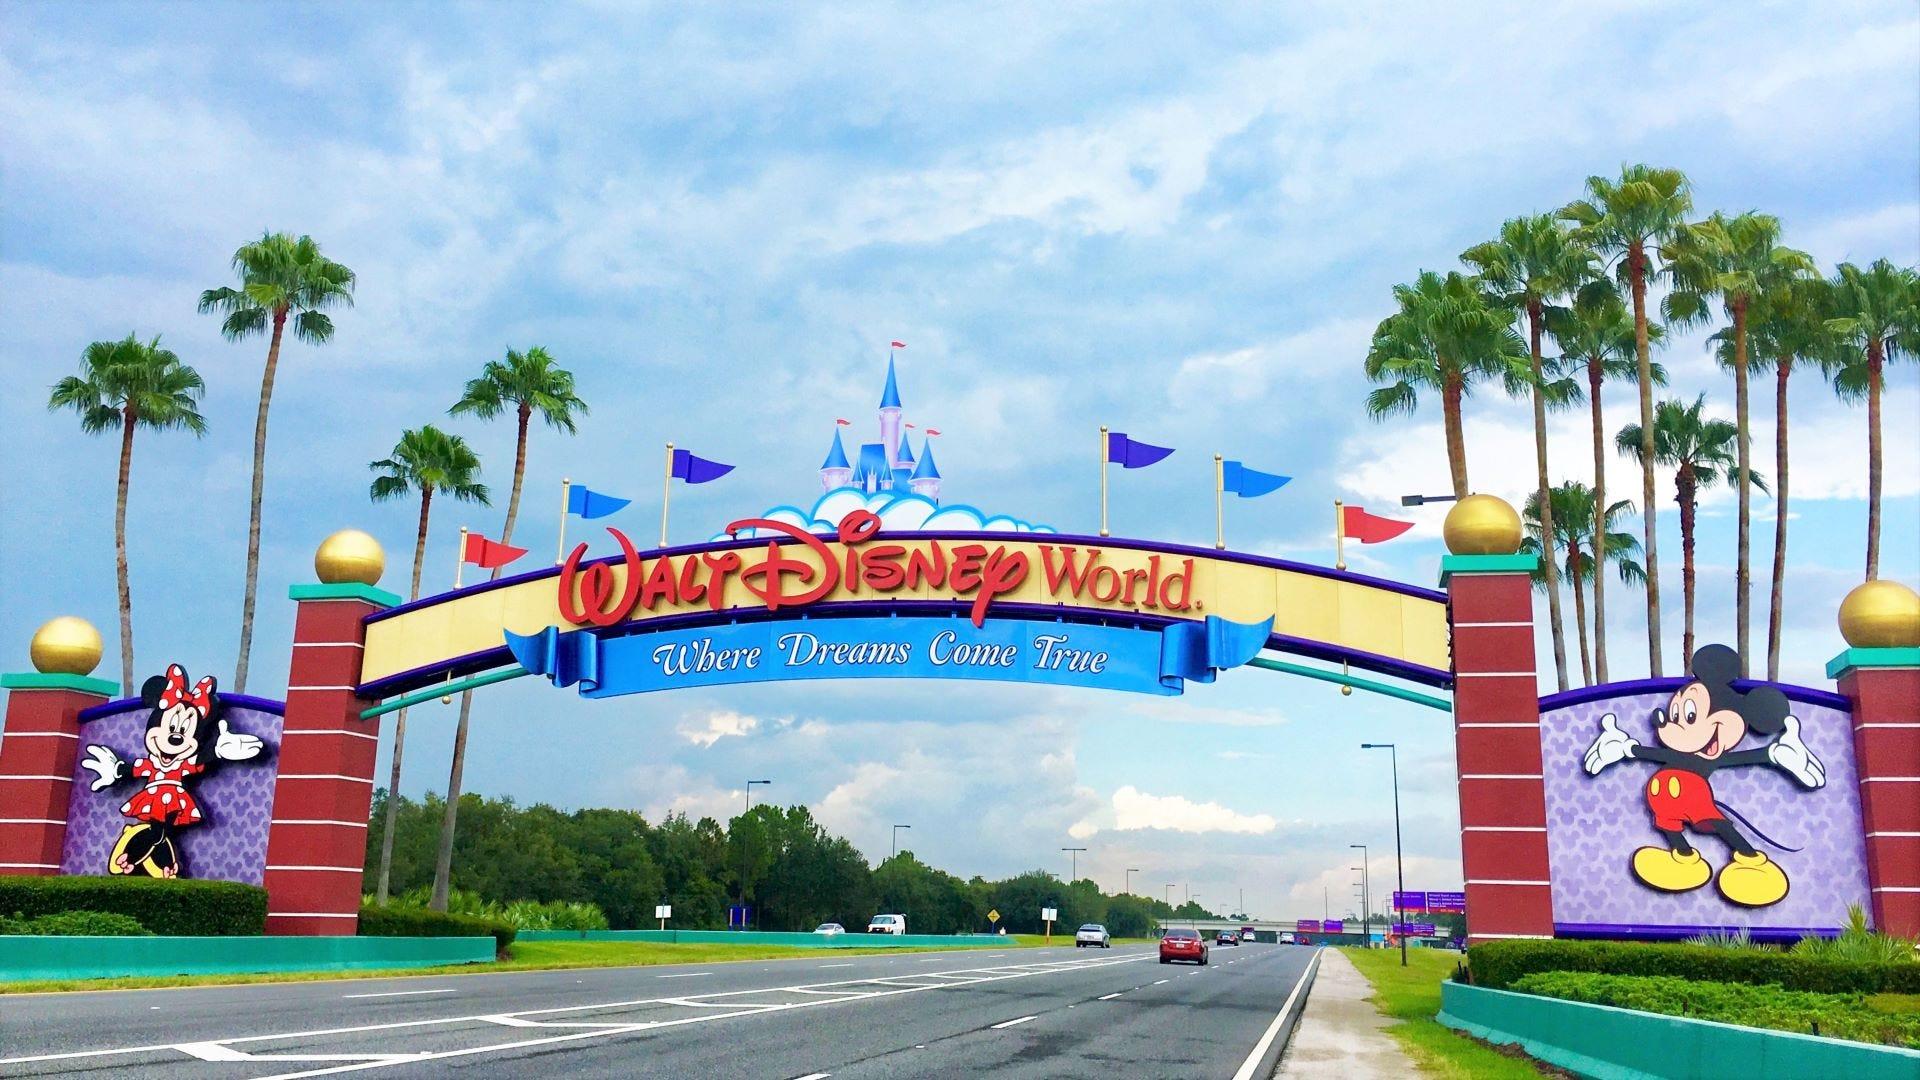 Entrance to Walt Disney World in Orlando, FLorida.